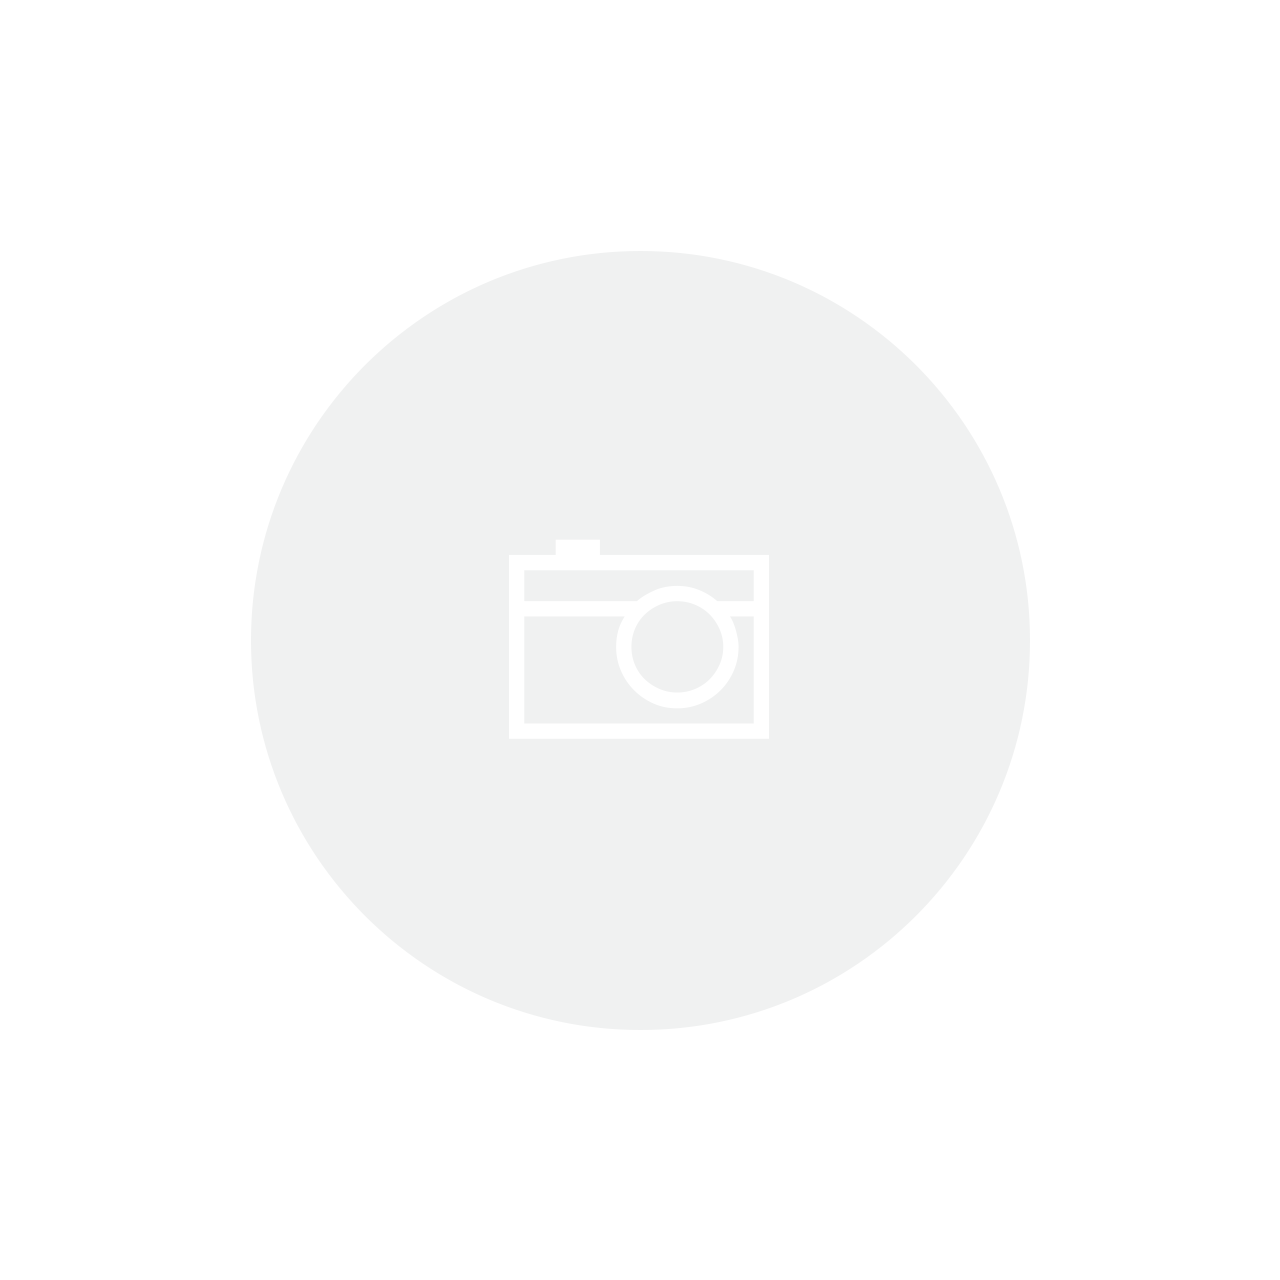 Garrafa de Vidro Sodo-calcico Revestida de Silicone Verde 35